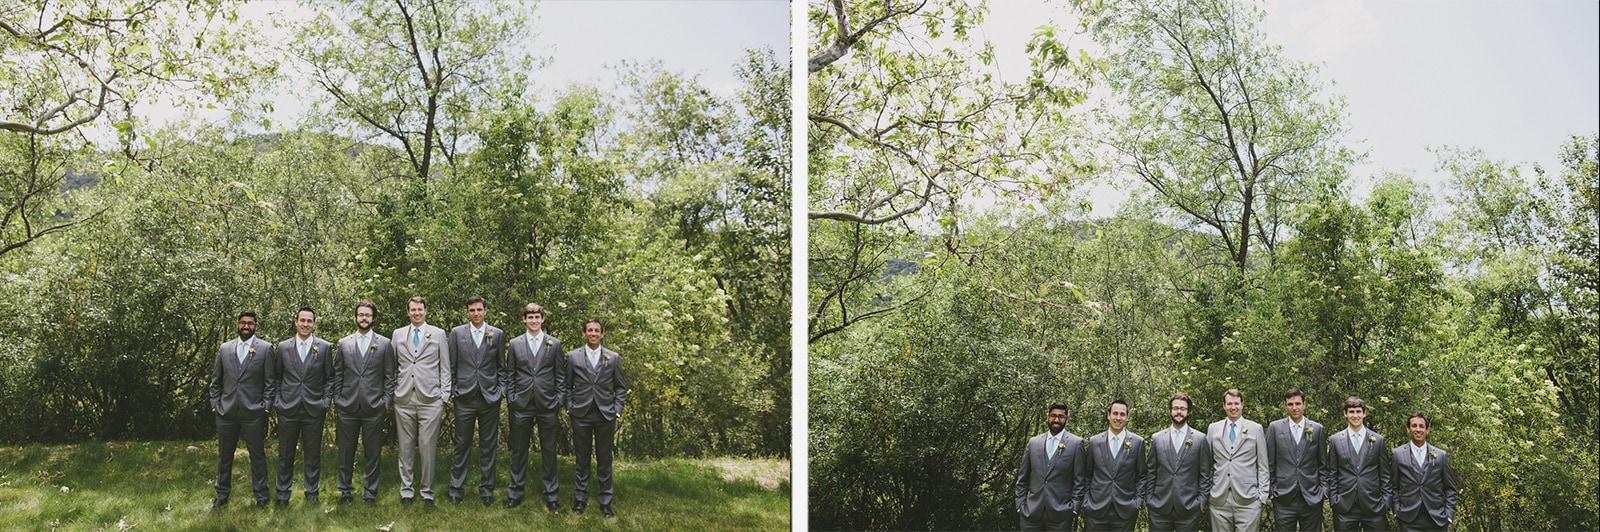 Carmel_Valley_Wedding_Gardener_Ranch_Wedding_009